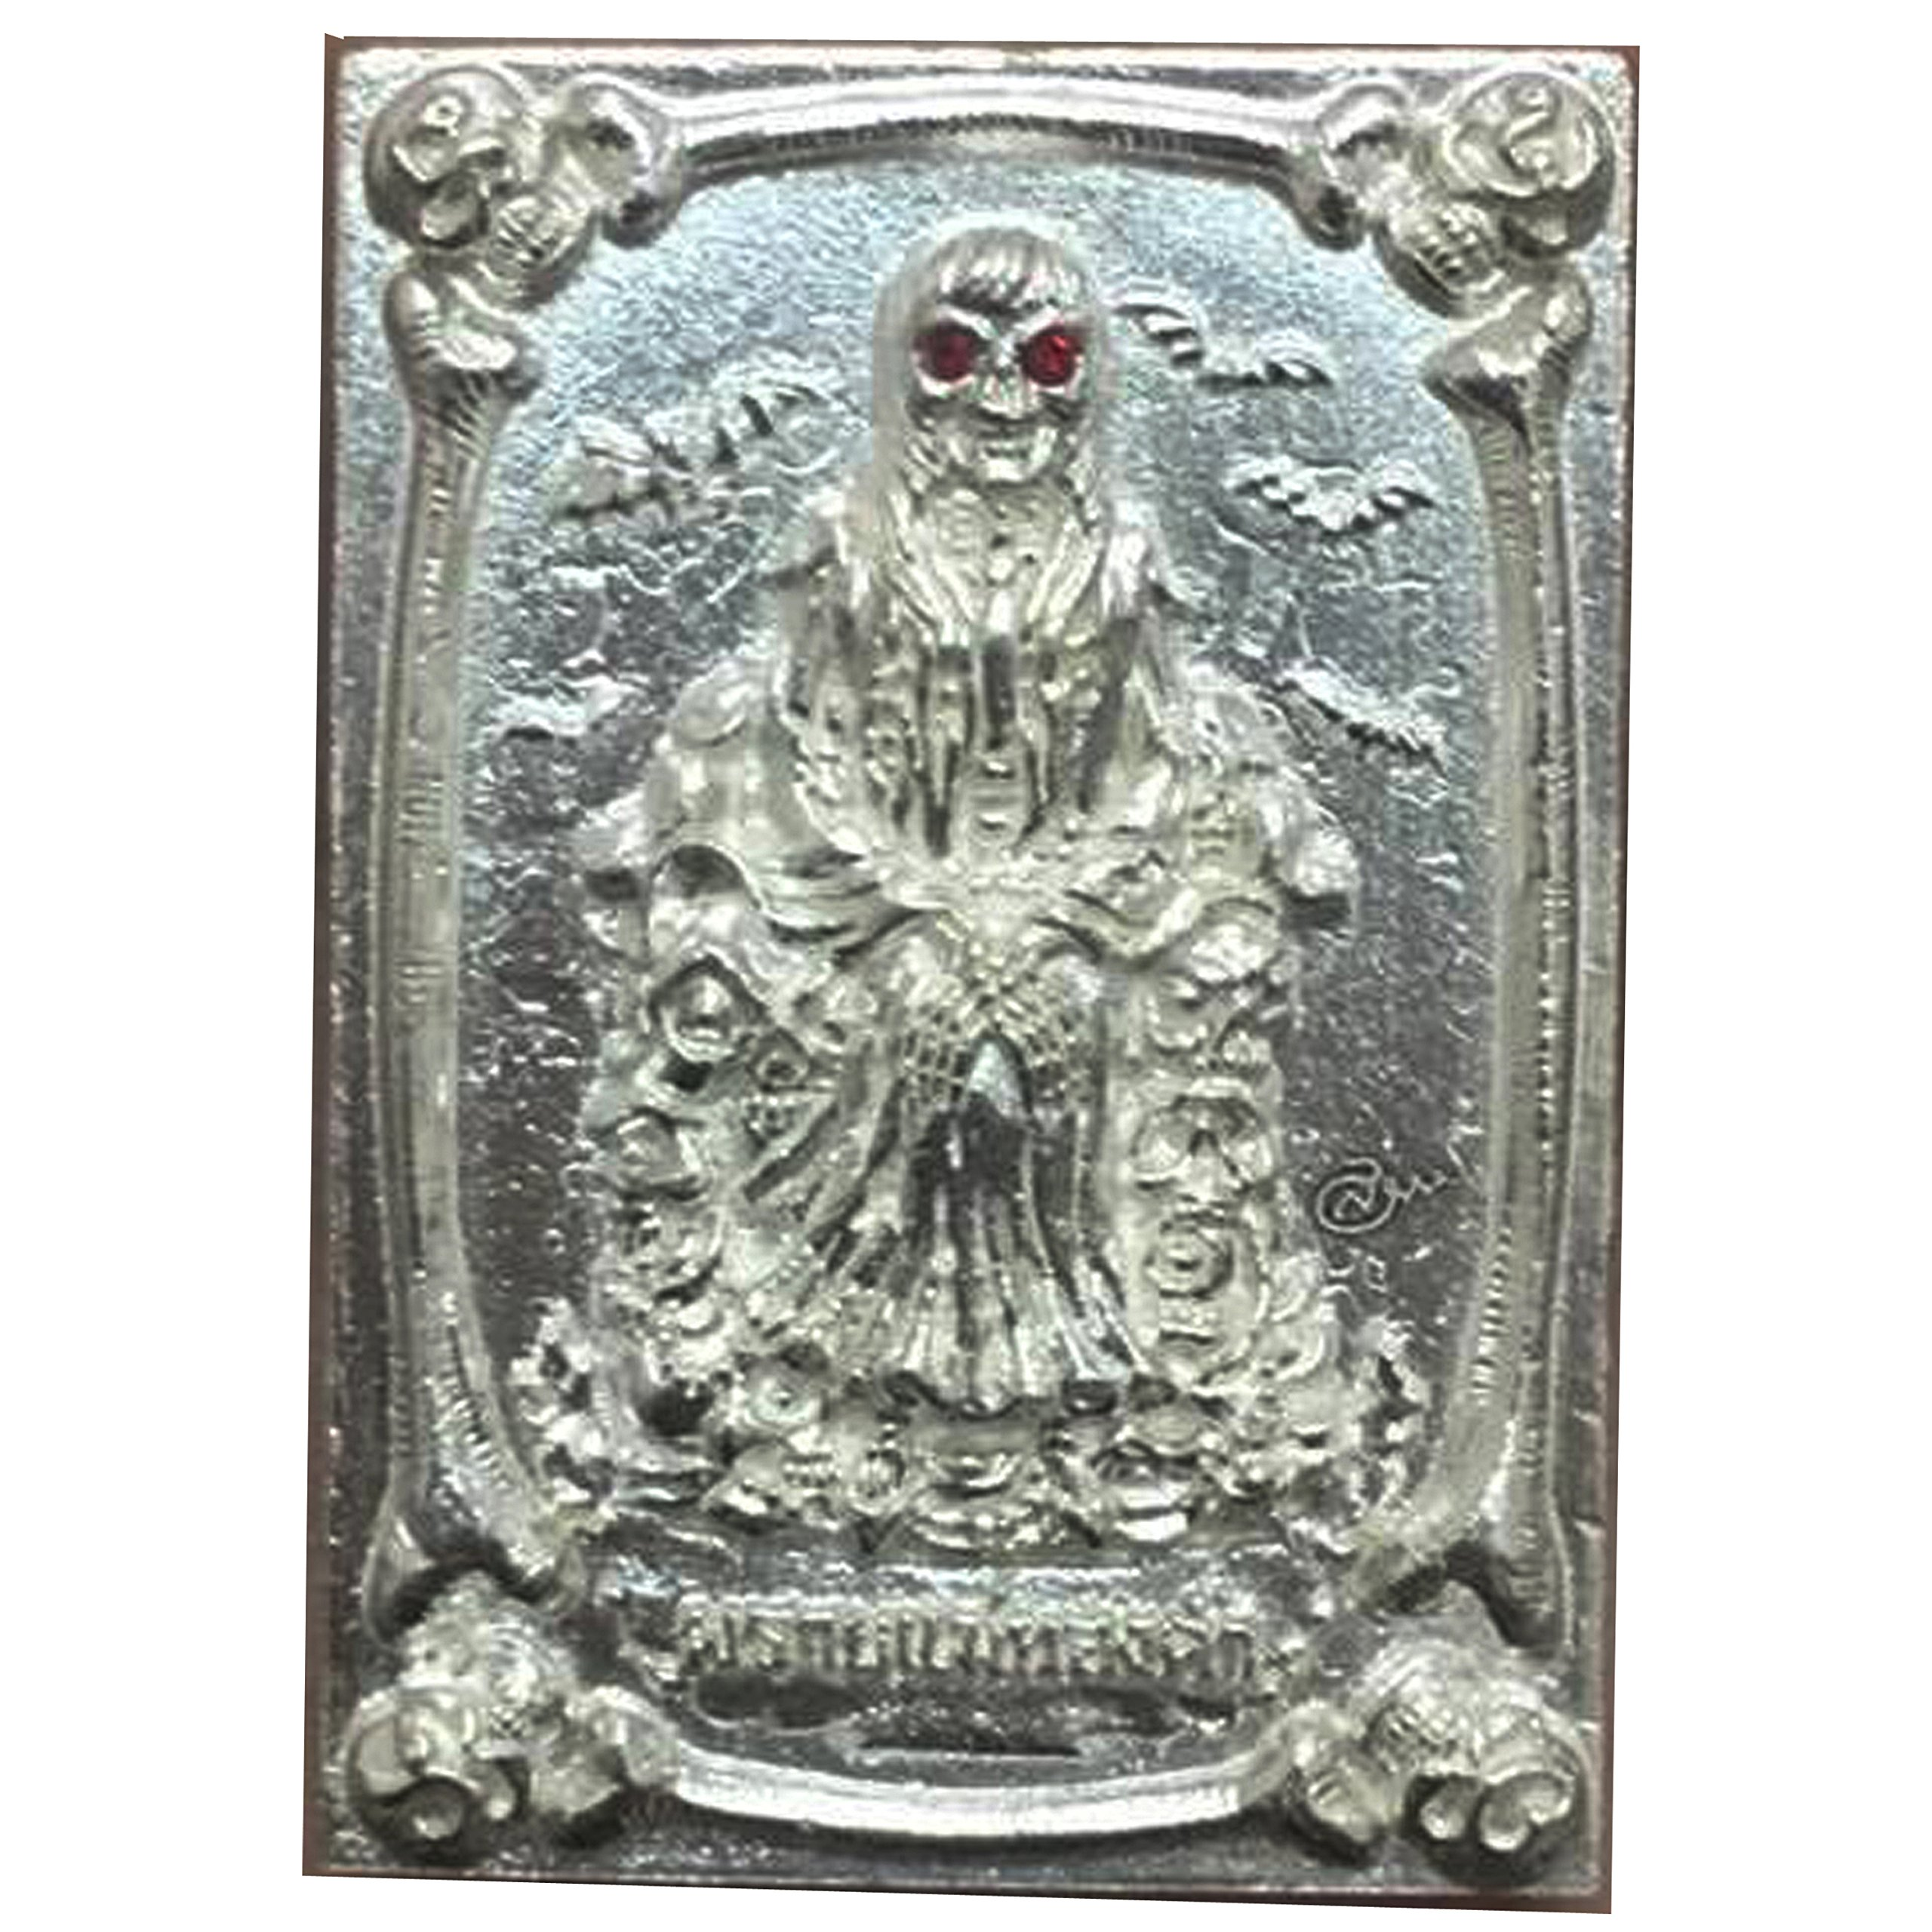 Good Luck Business Jewelry Magic Pendant Phrai Mae Tongkaam Naa Nah Tong Riagtraab Raabchock Amulet by Kruuba Subin by Amulet Land (Image #1)